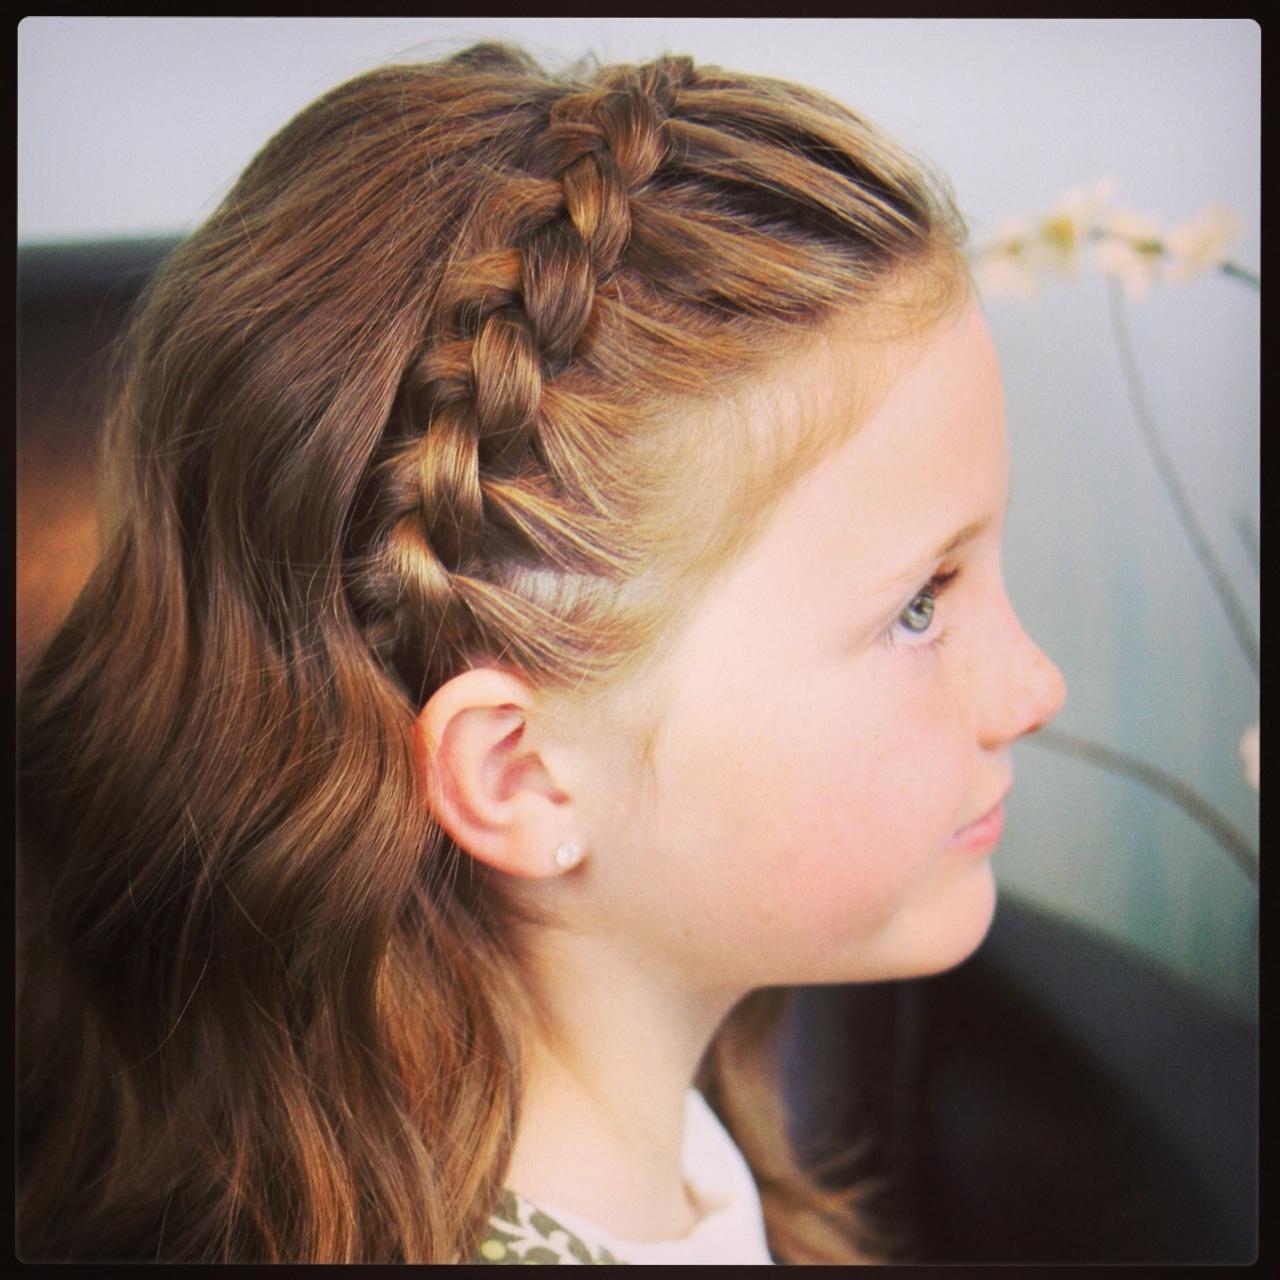 dutch-lace-braided-headband-braid-hairstyles-cute-girls-hairstyles-intended-for-headband-hairstyles-v-cut-and-u-cut-hairstyles dutch-lace-braided-headband-braid-hairstyles-cute-girls-hairstyles-intended-for-headband-hairstyles-v-cut-and-u-cut-hairstyles